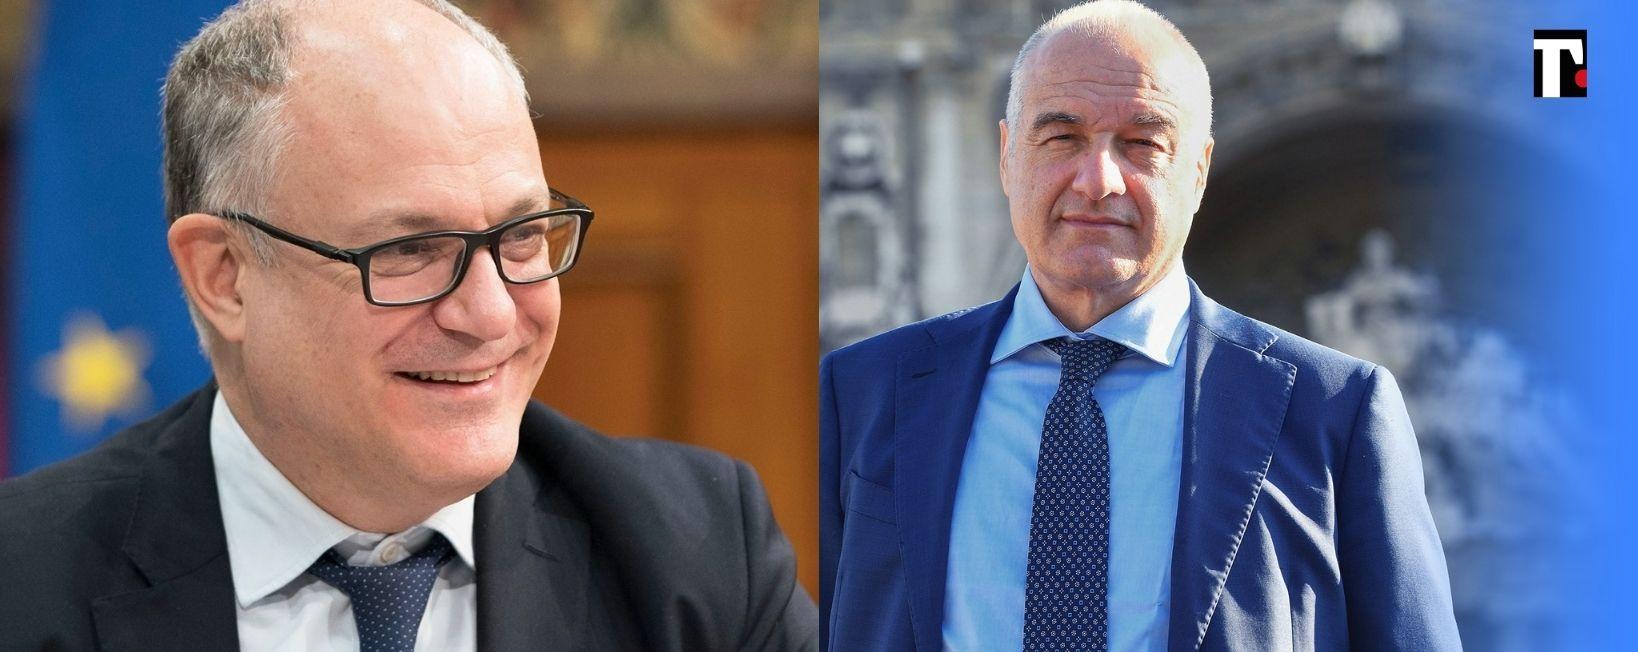 Ballottaggio Roma 2021 affluenza urne